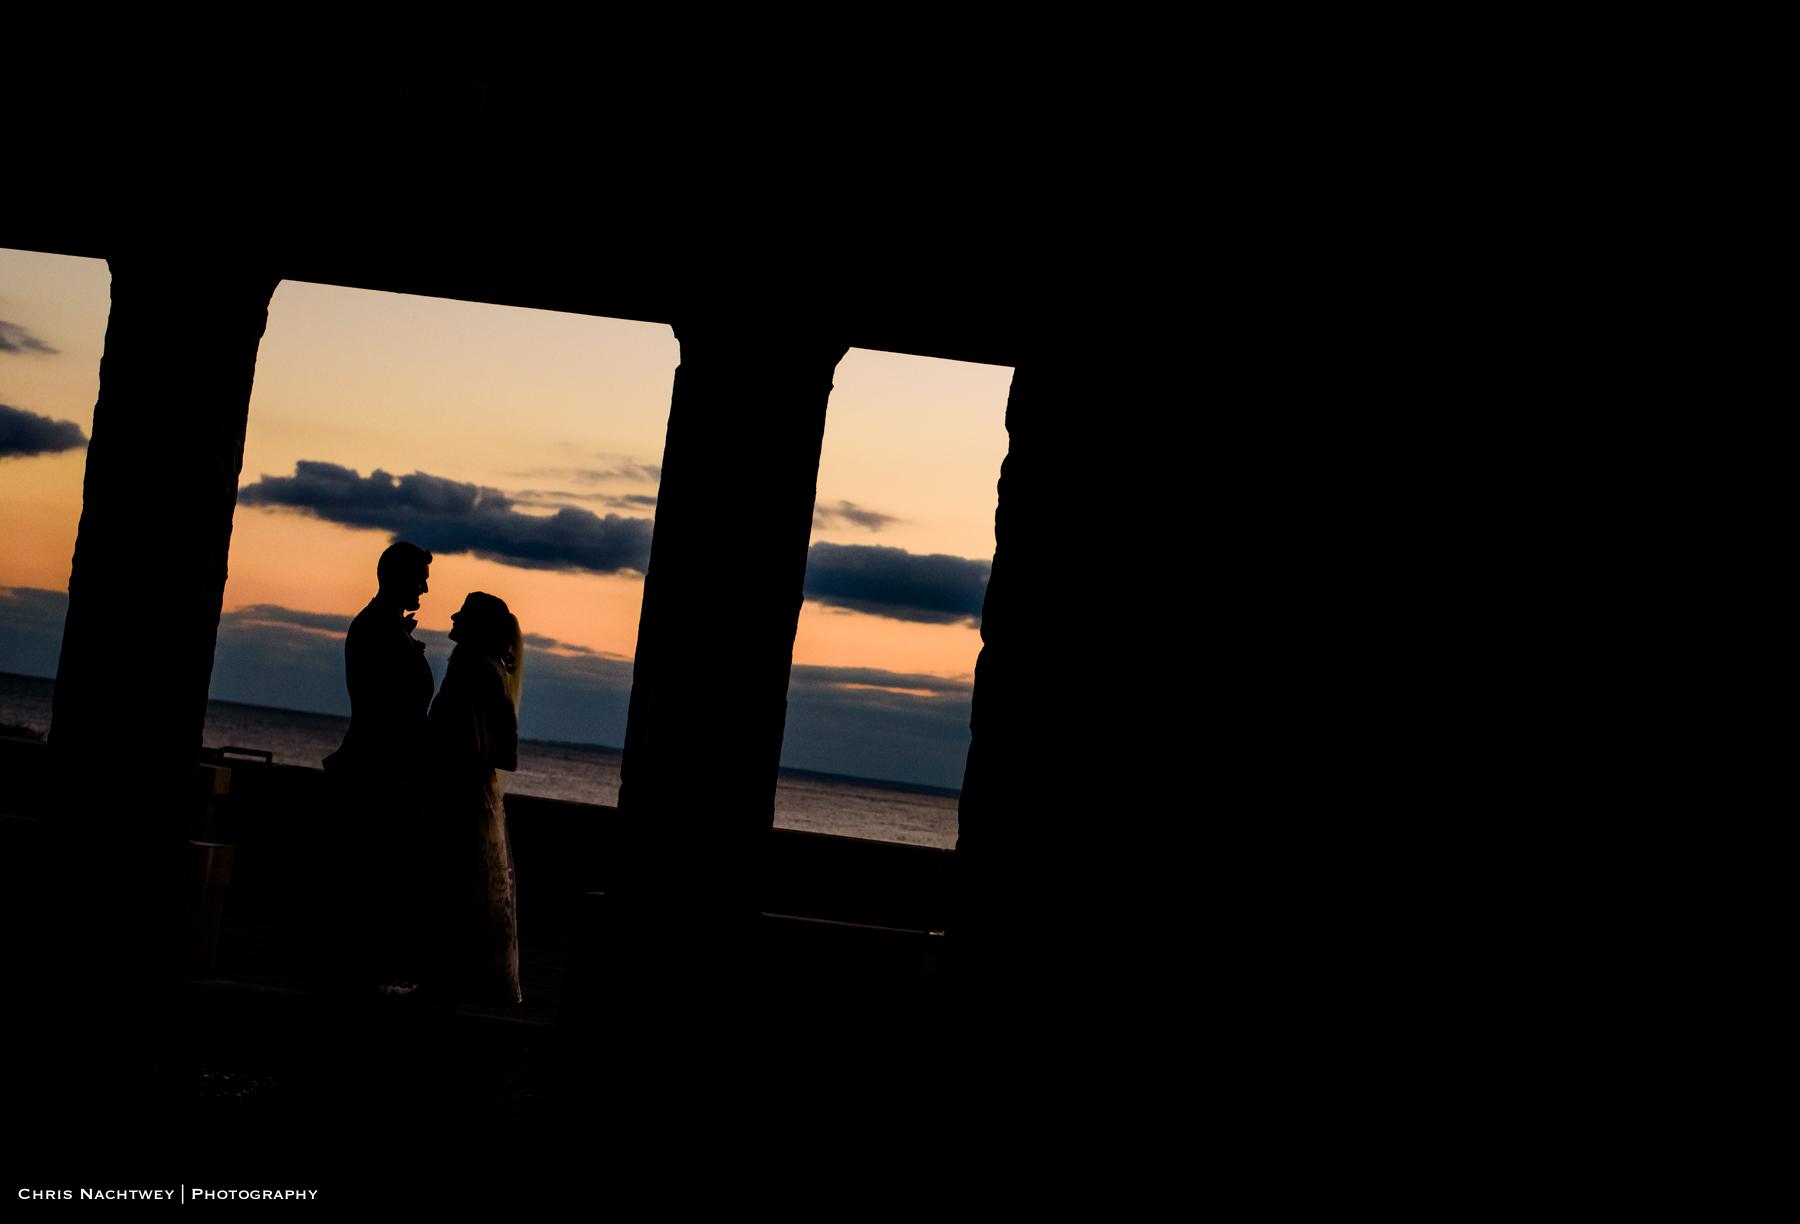 winter-branford-house-wedding-photos-groton-ct-chris-nachtwey-photography-2019-26.jpg